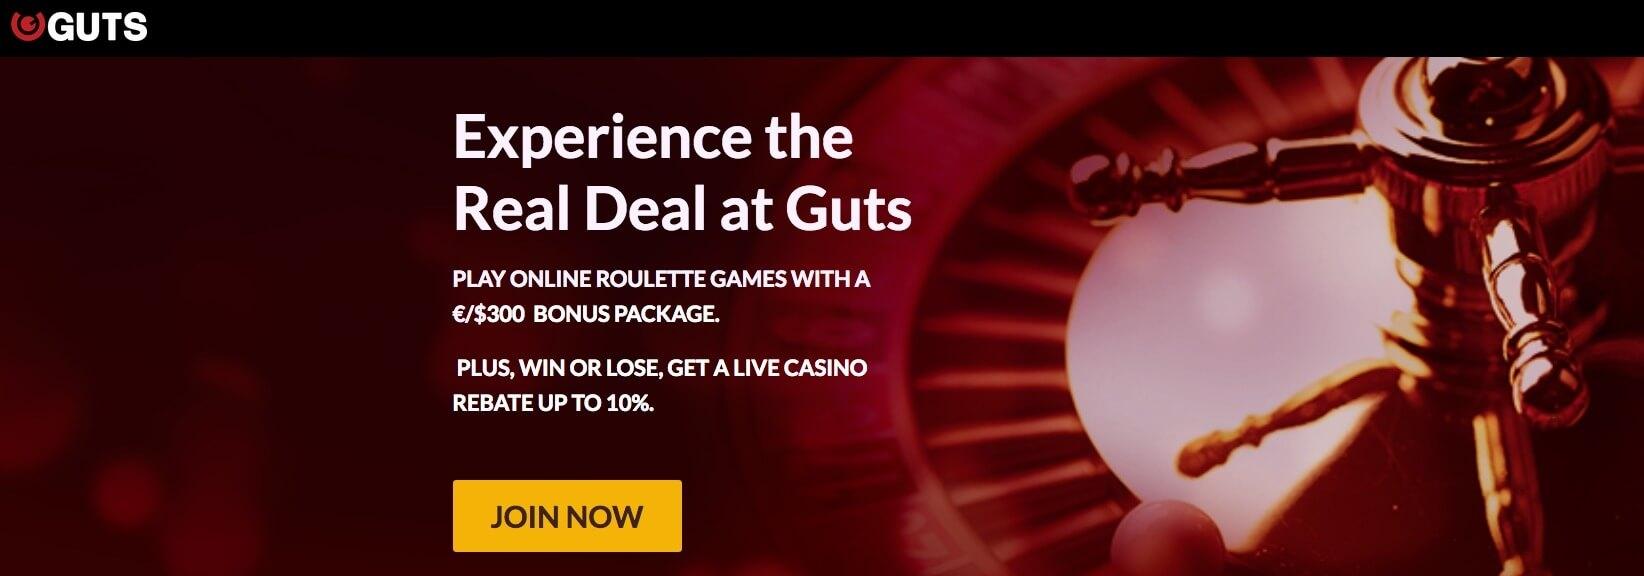 slotocash casino USA